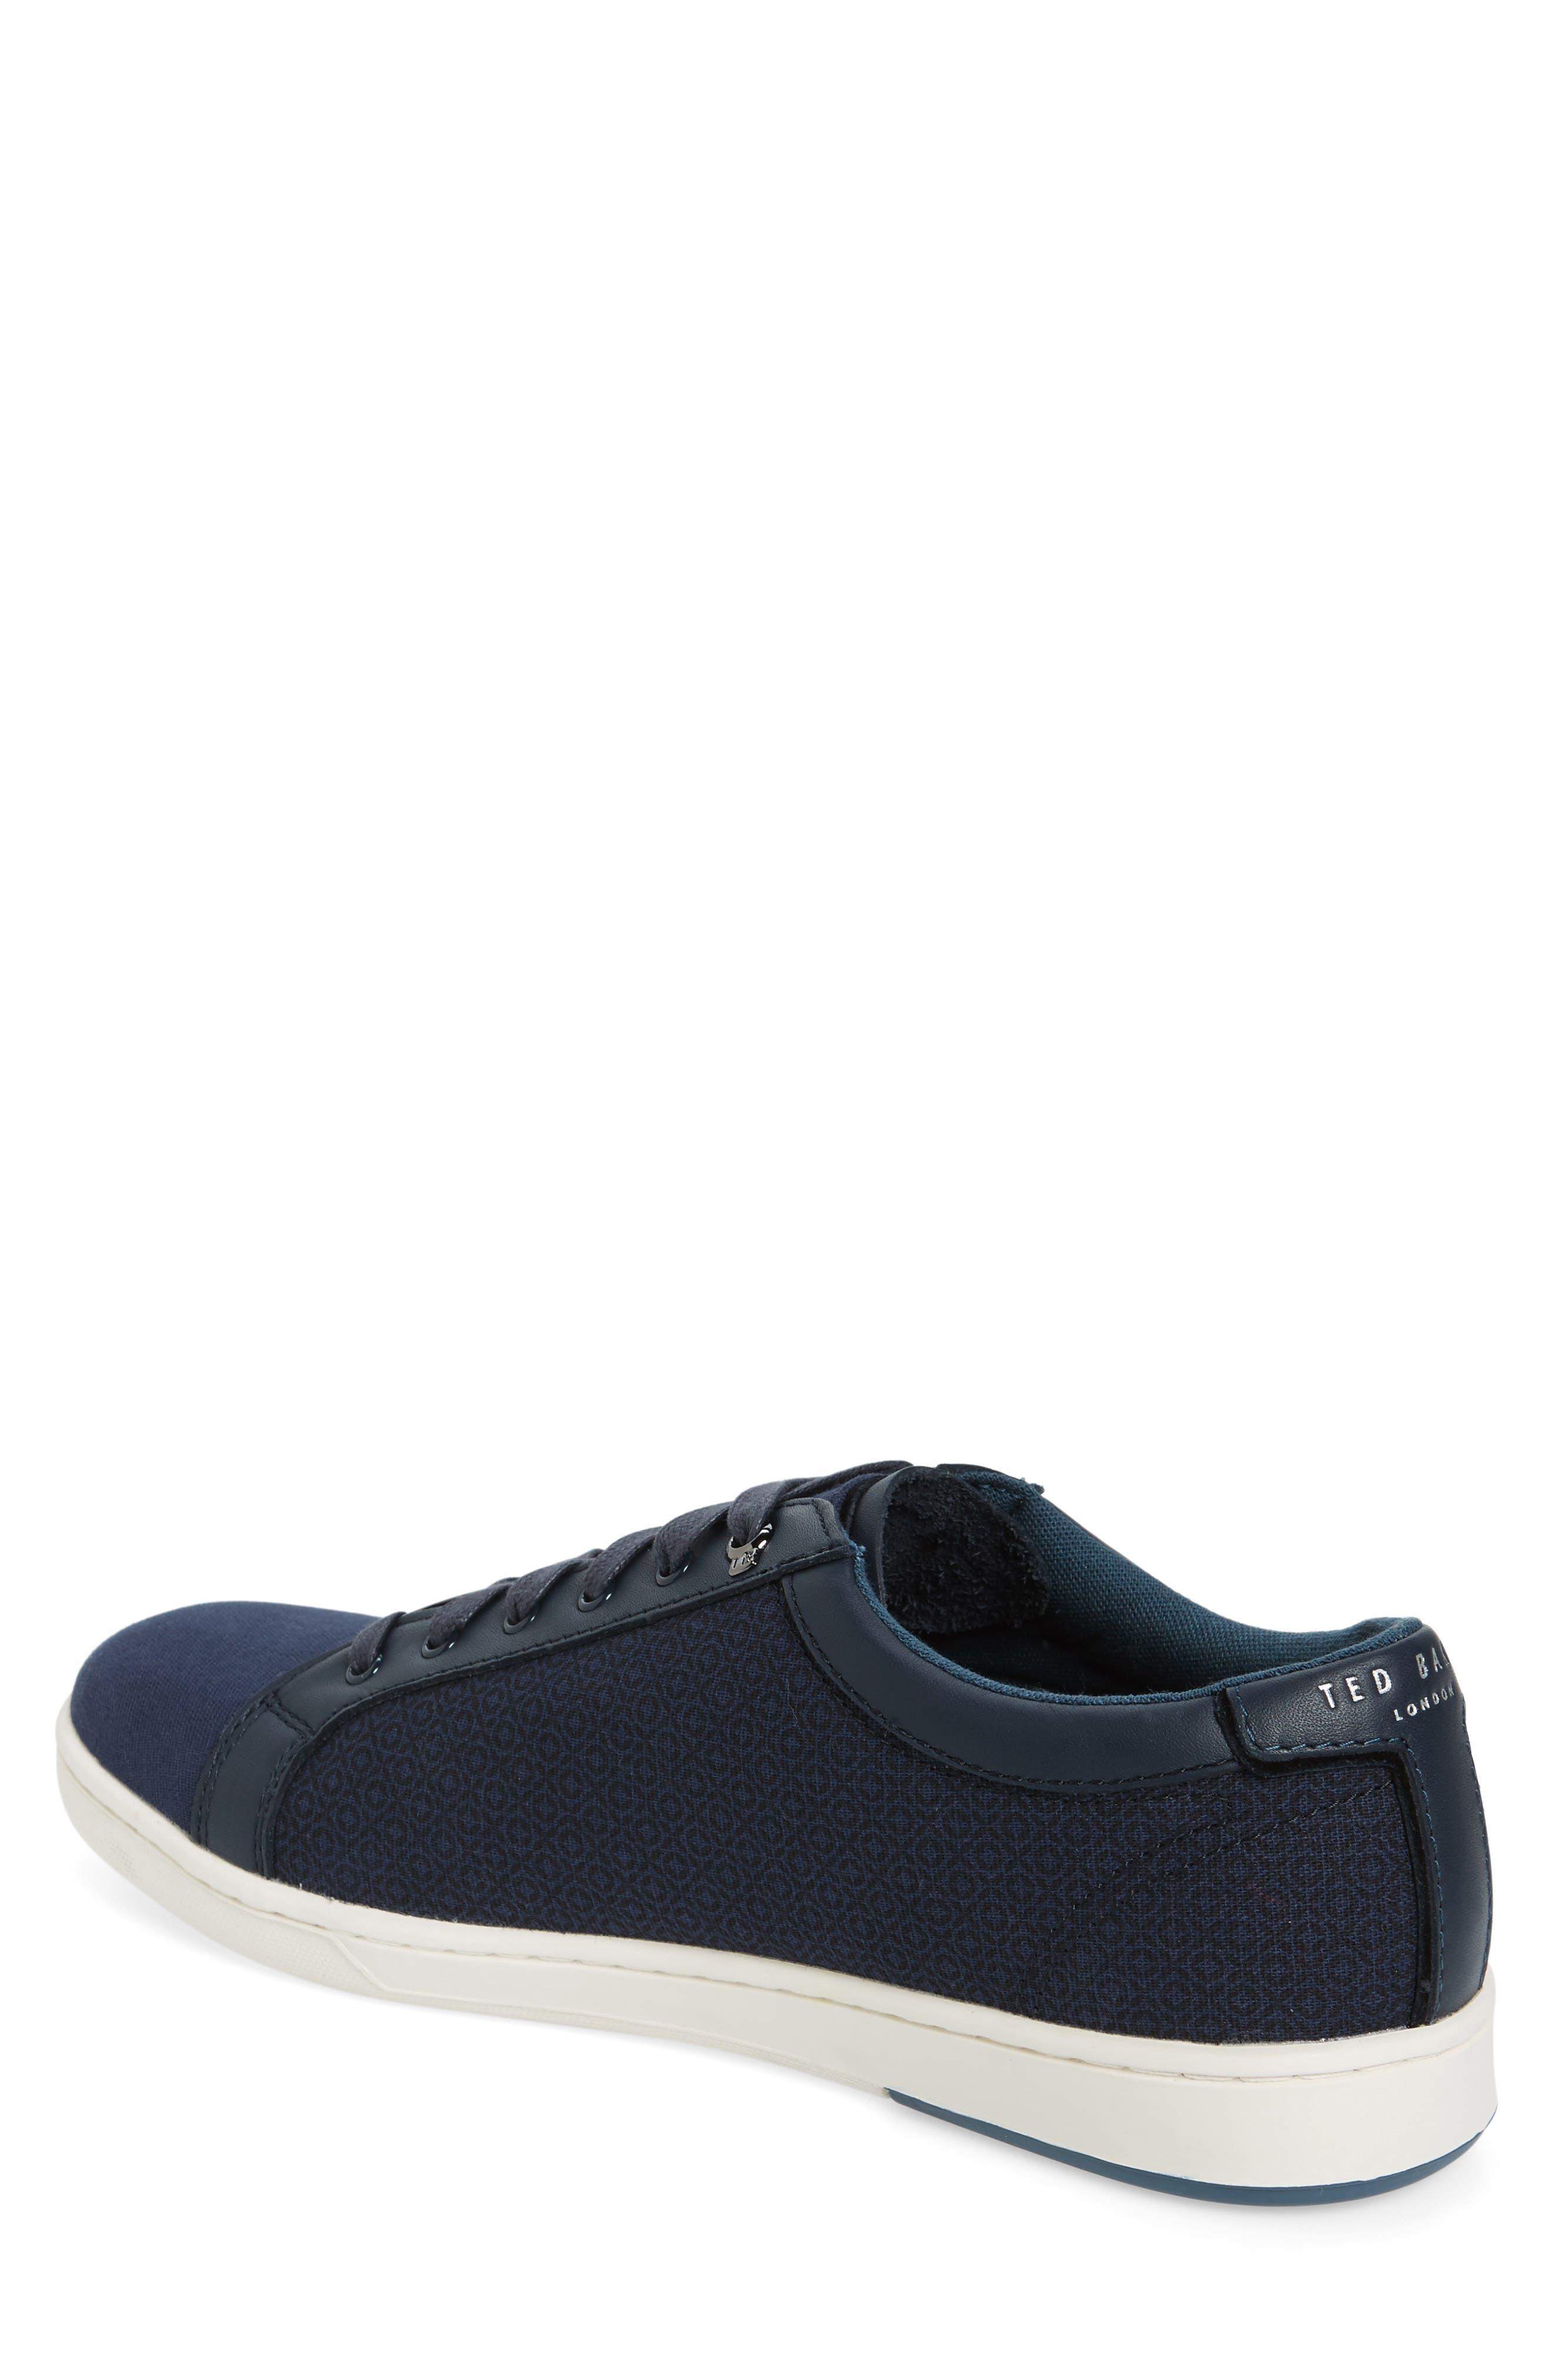 Ternur Geo Print Sneaker,                             Alternate thumbnail 2, color,                             Dark Blue